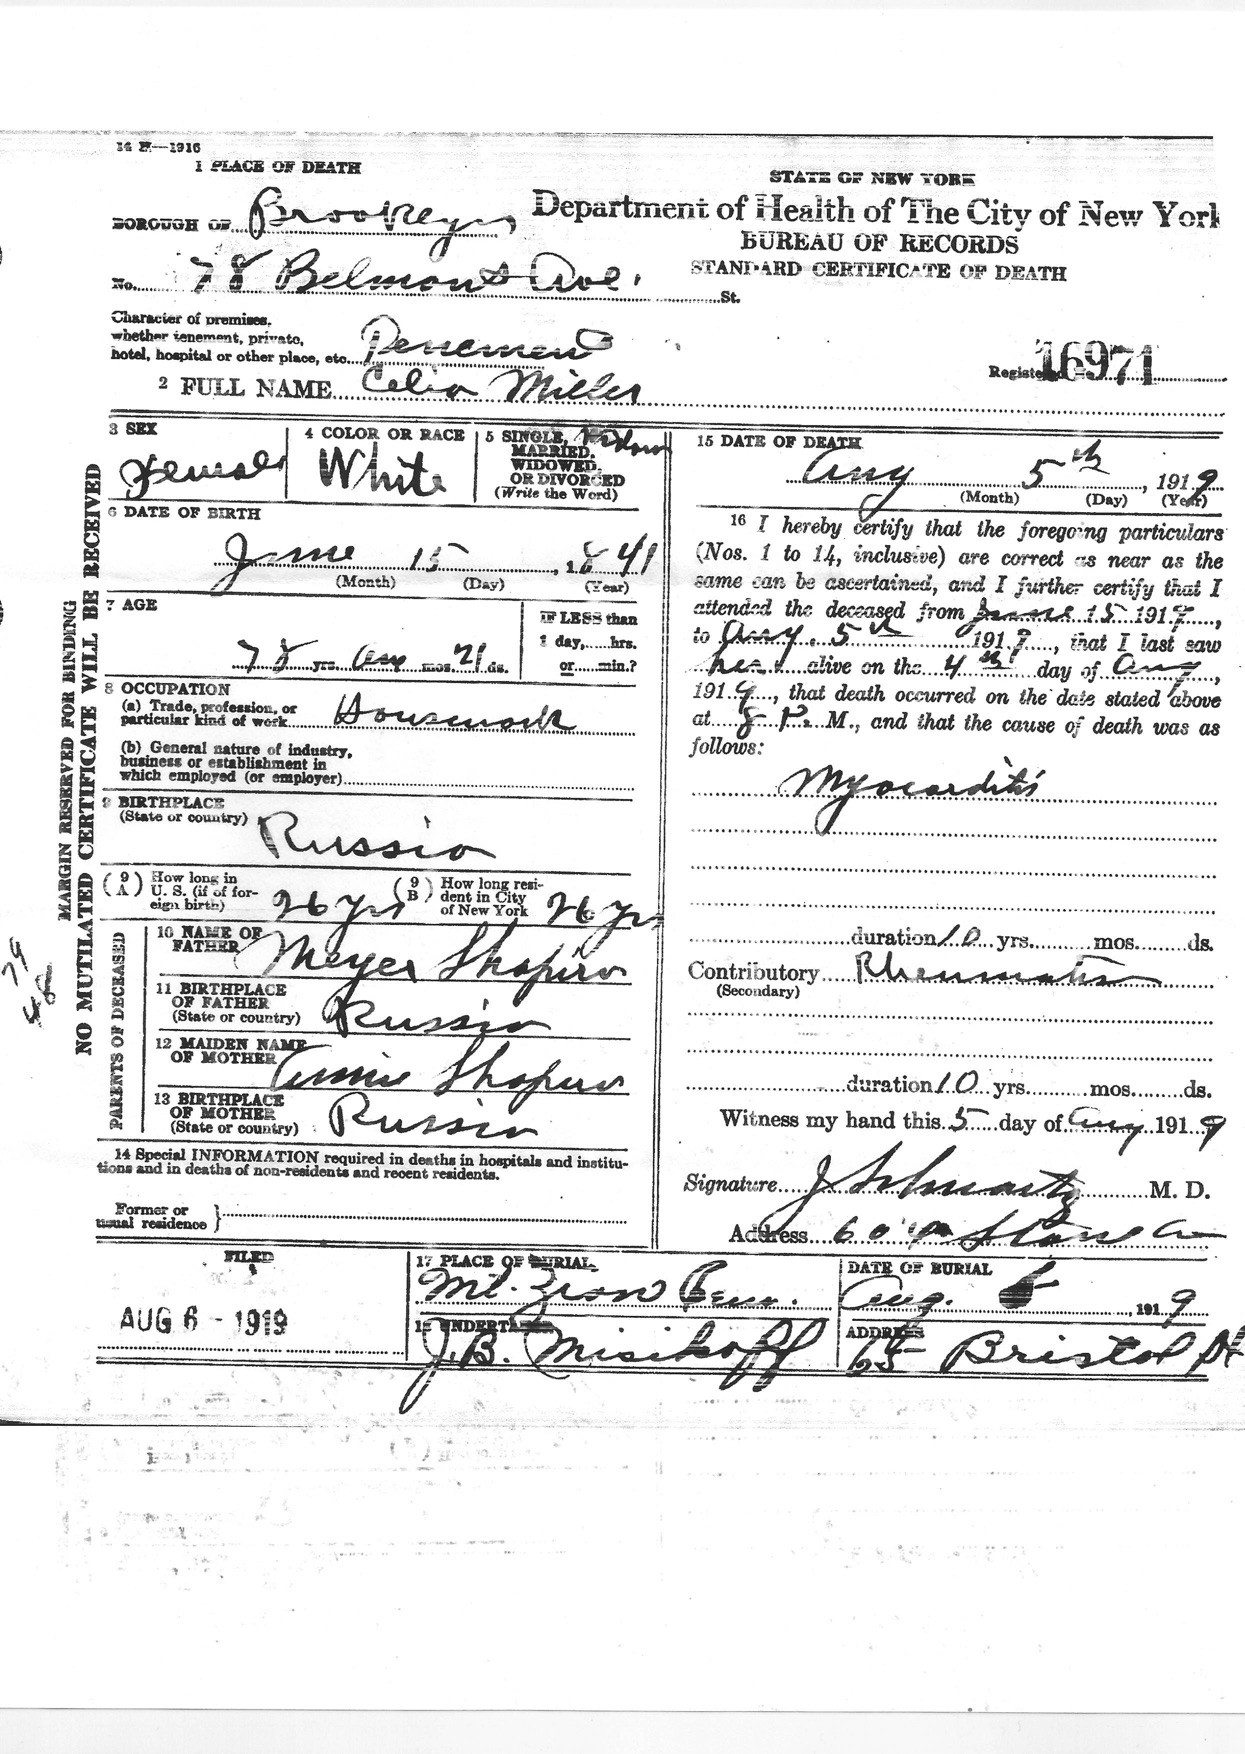 Dora Miller's death certificate, 1919.